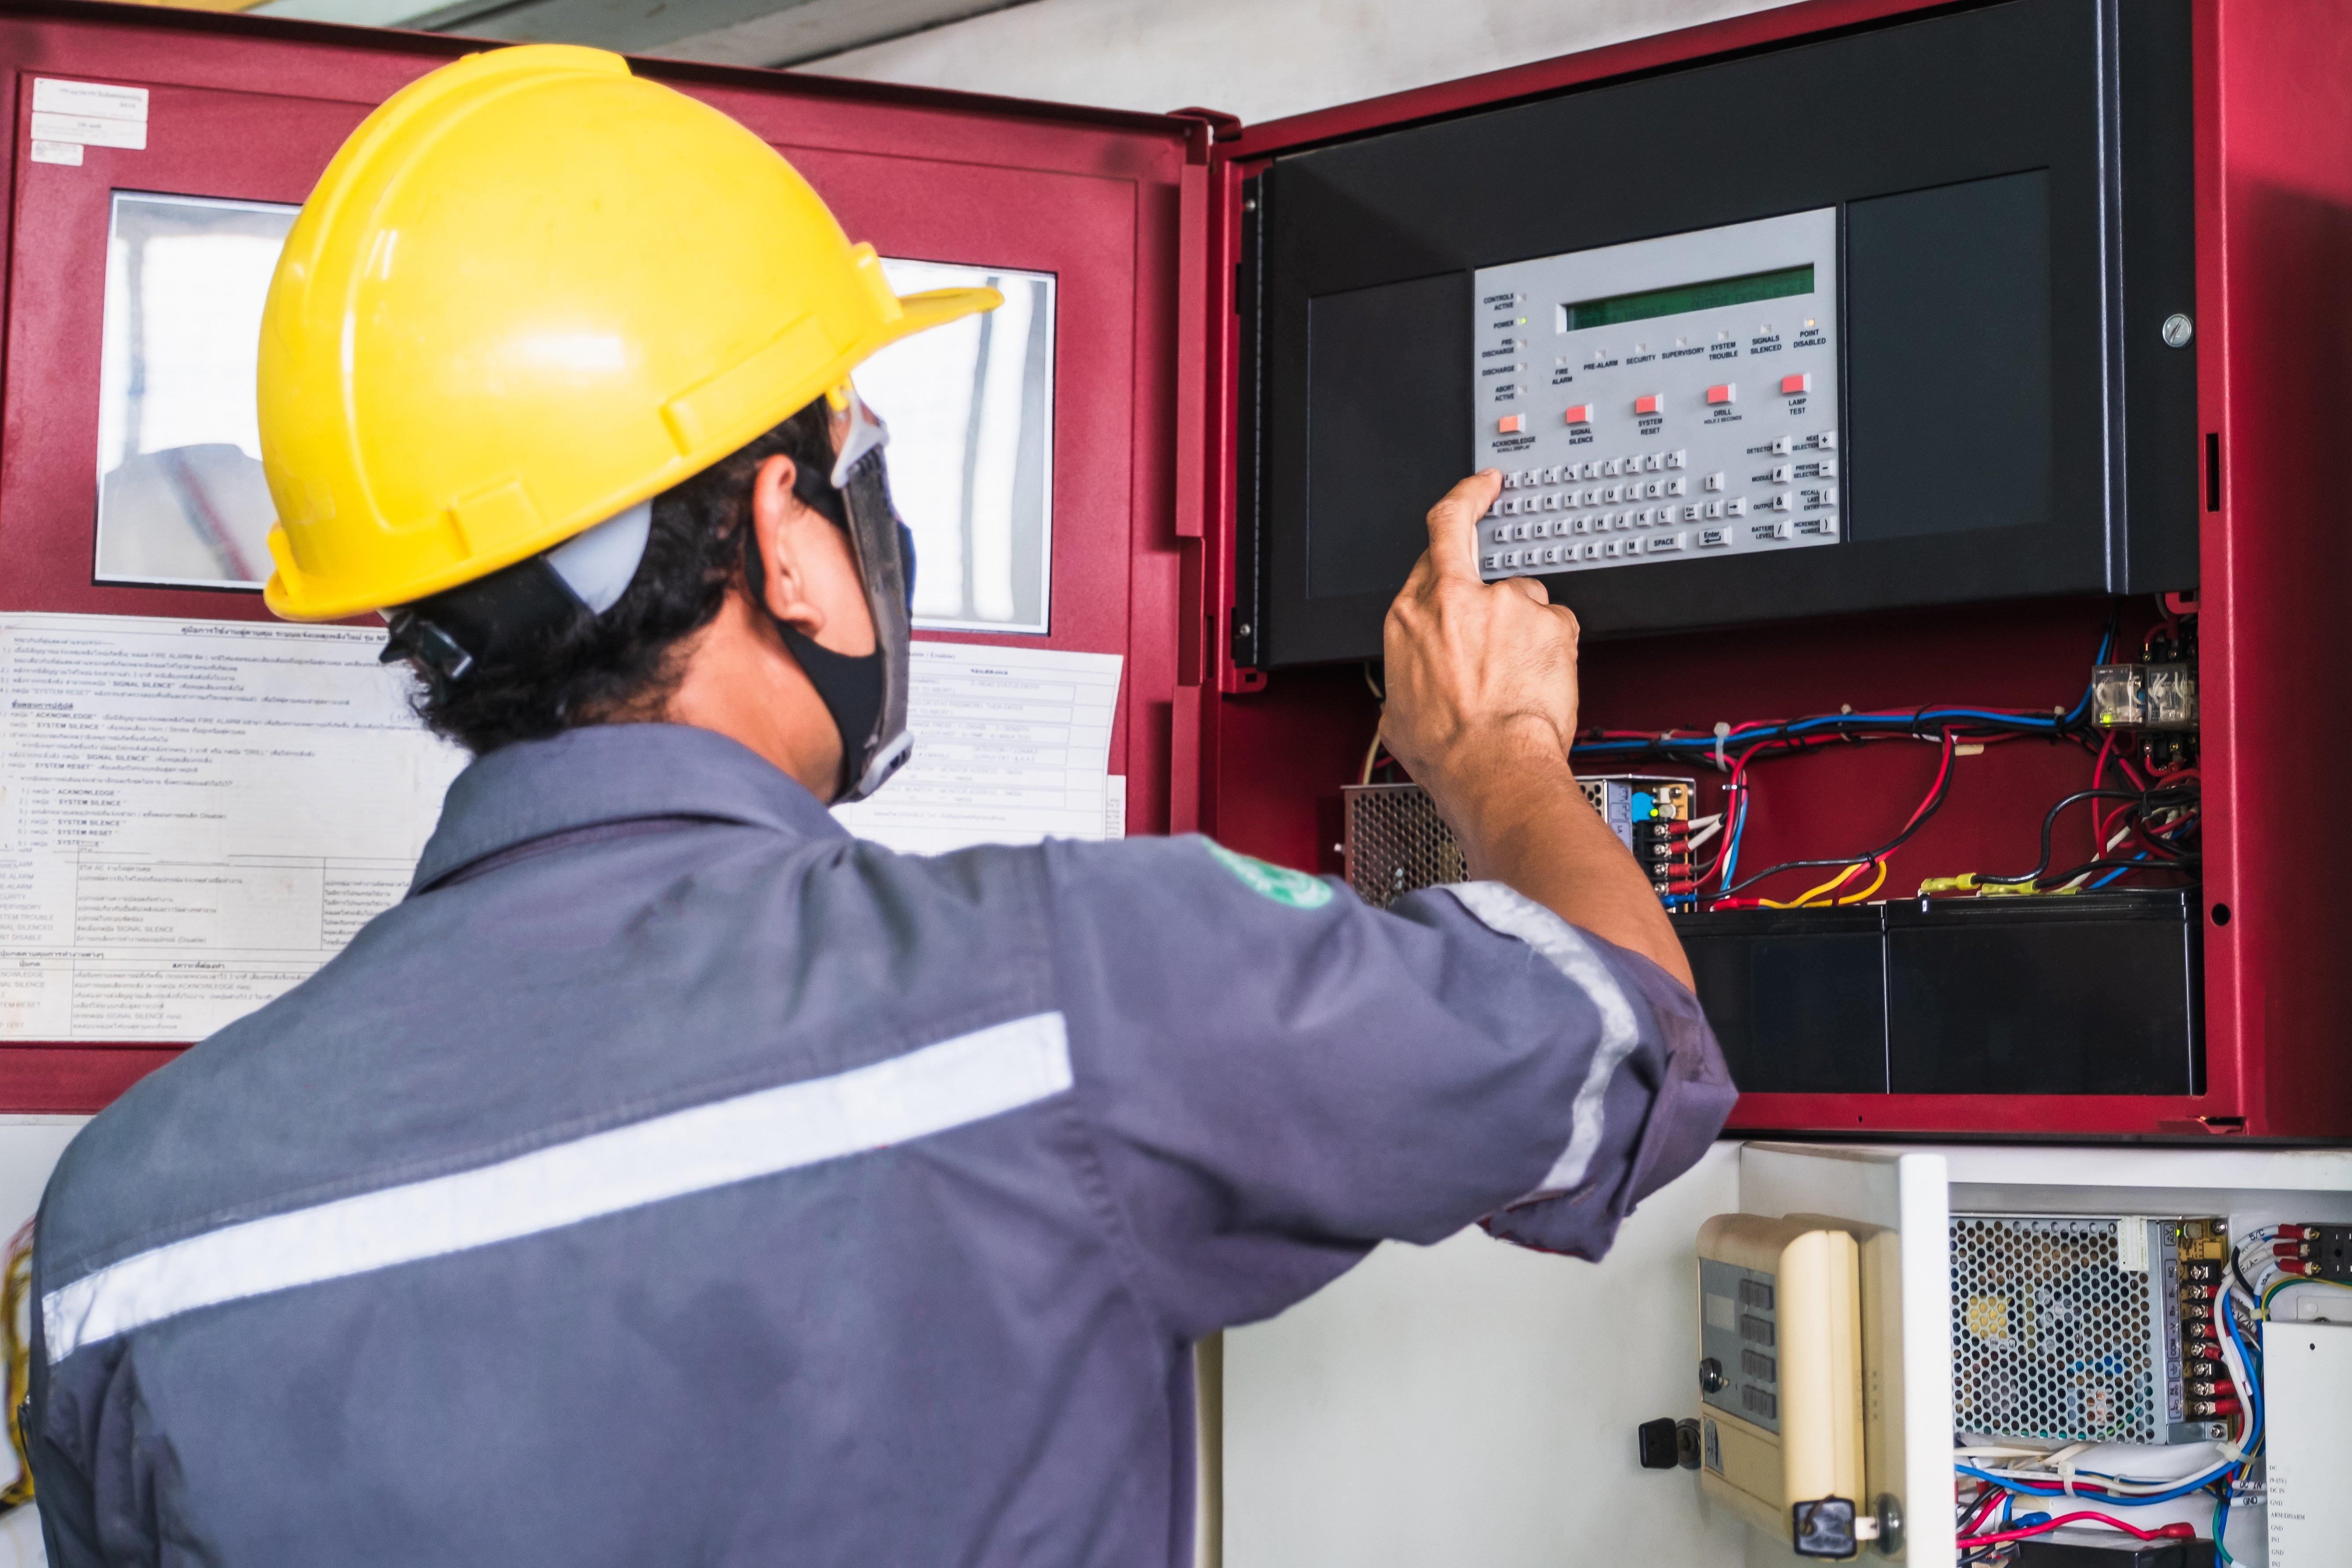 Worker technician working on fire alarm system